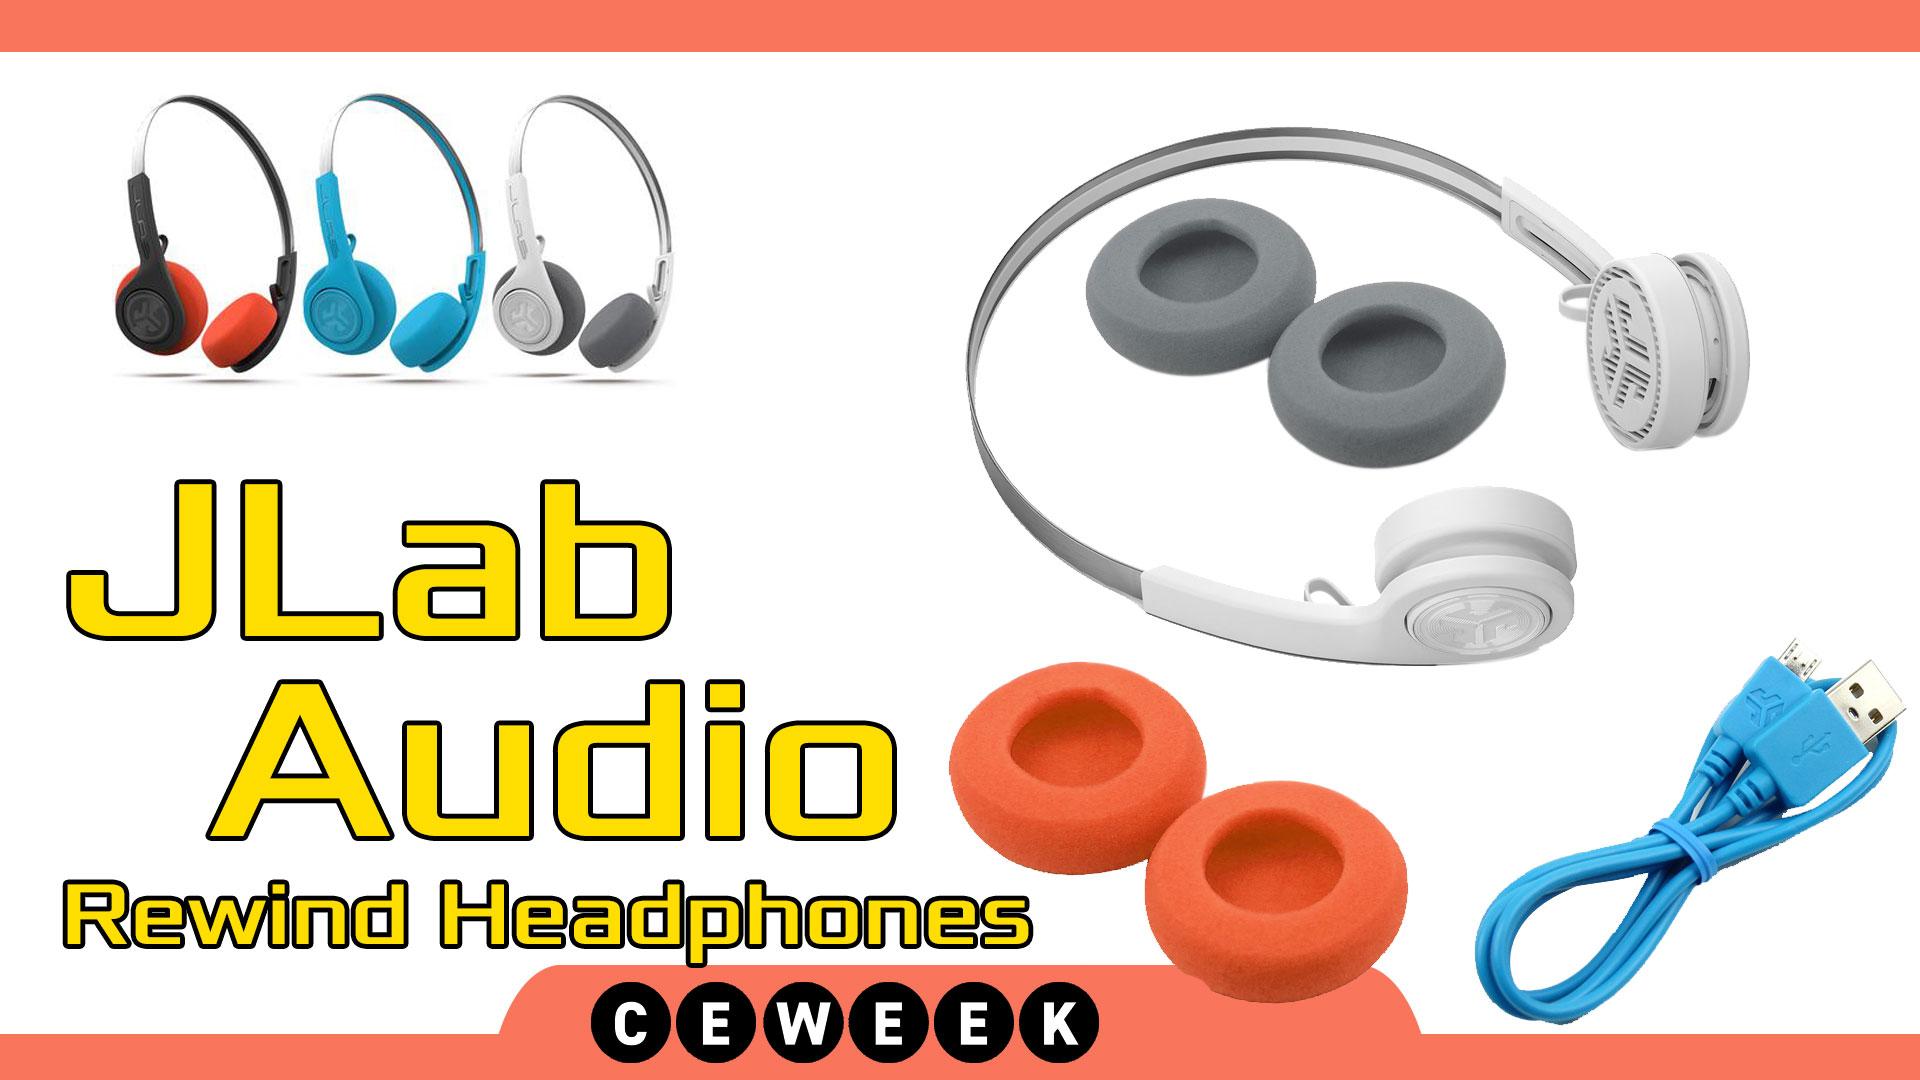 Jlab Audio Rewind Headphones